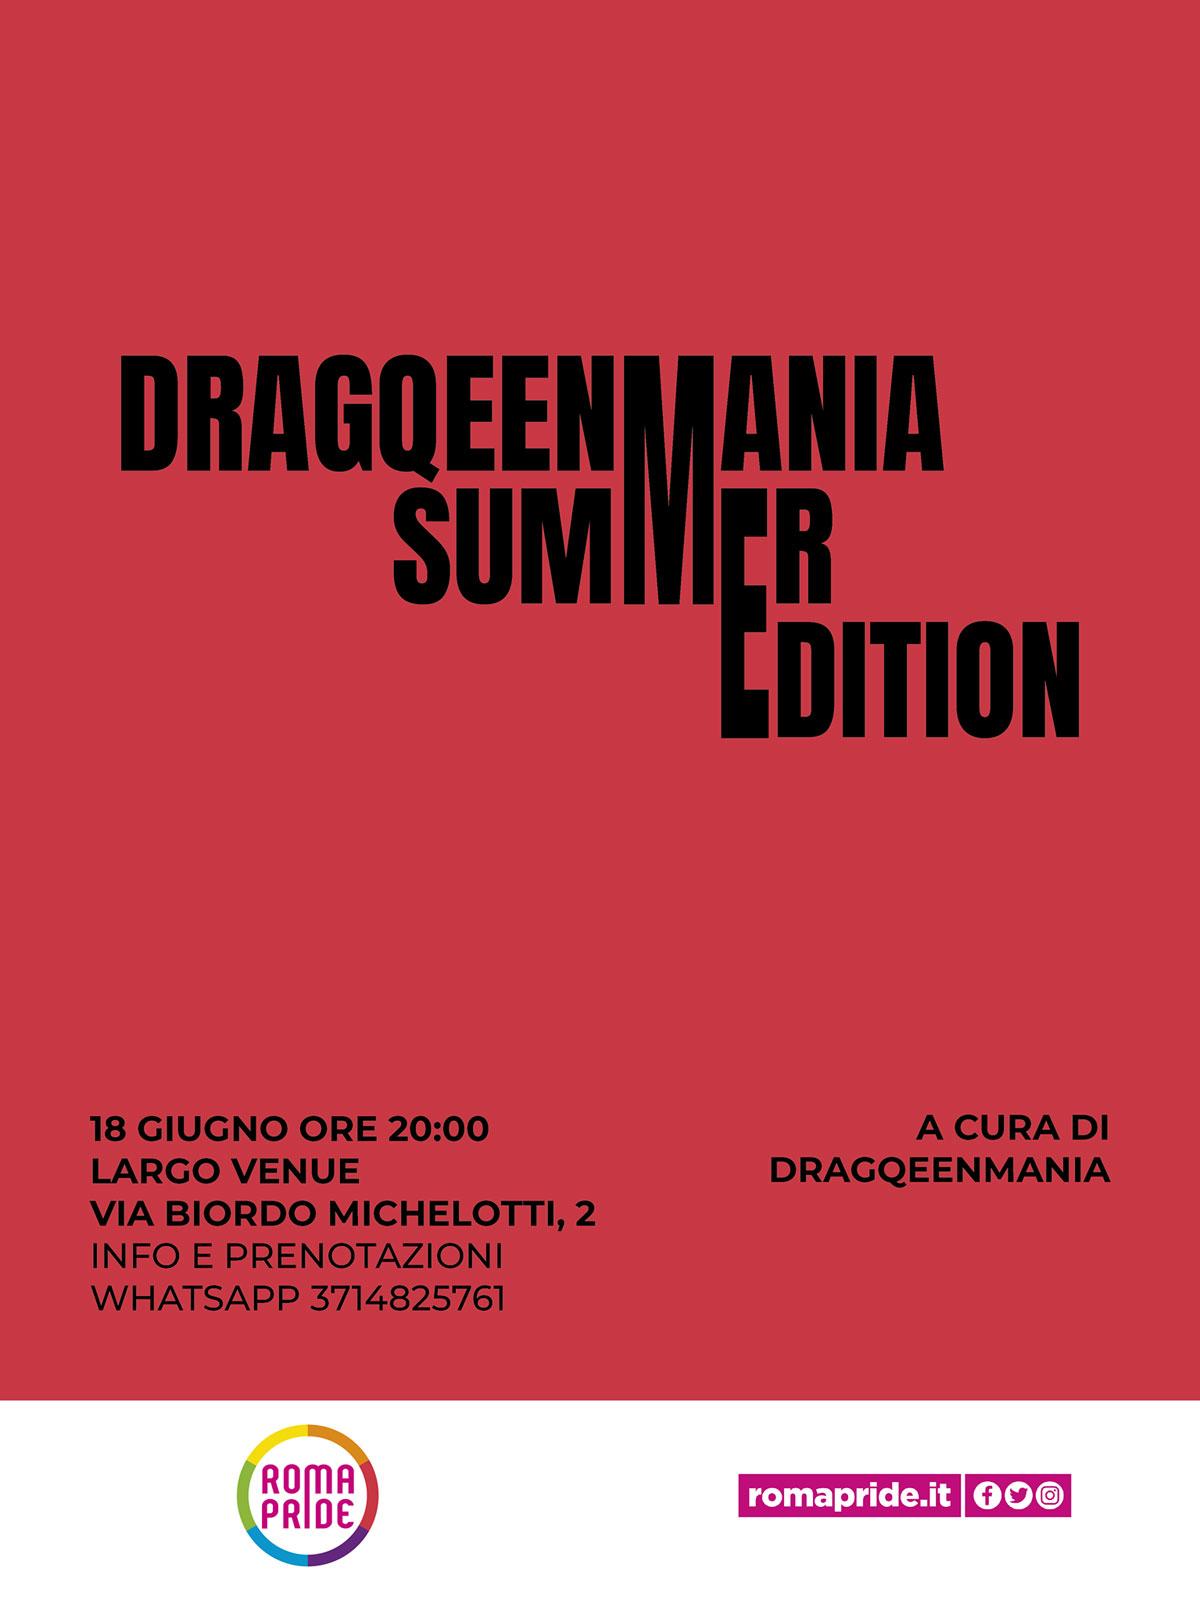 Roma Pride 2021 - Drag Queen Mania Summer Edition